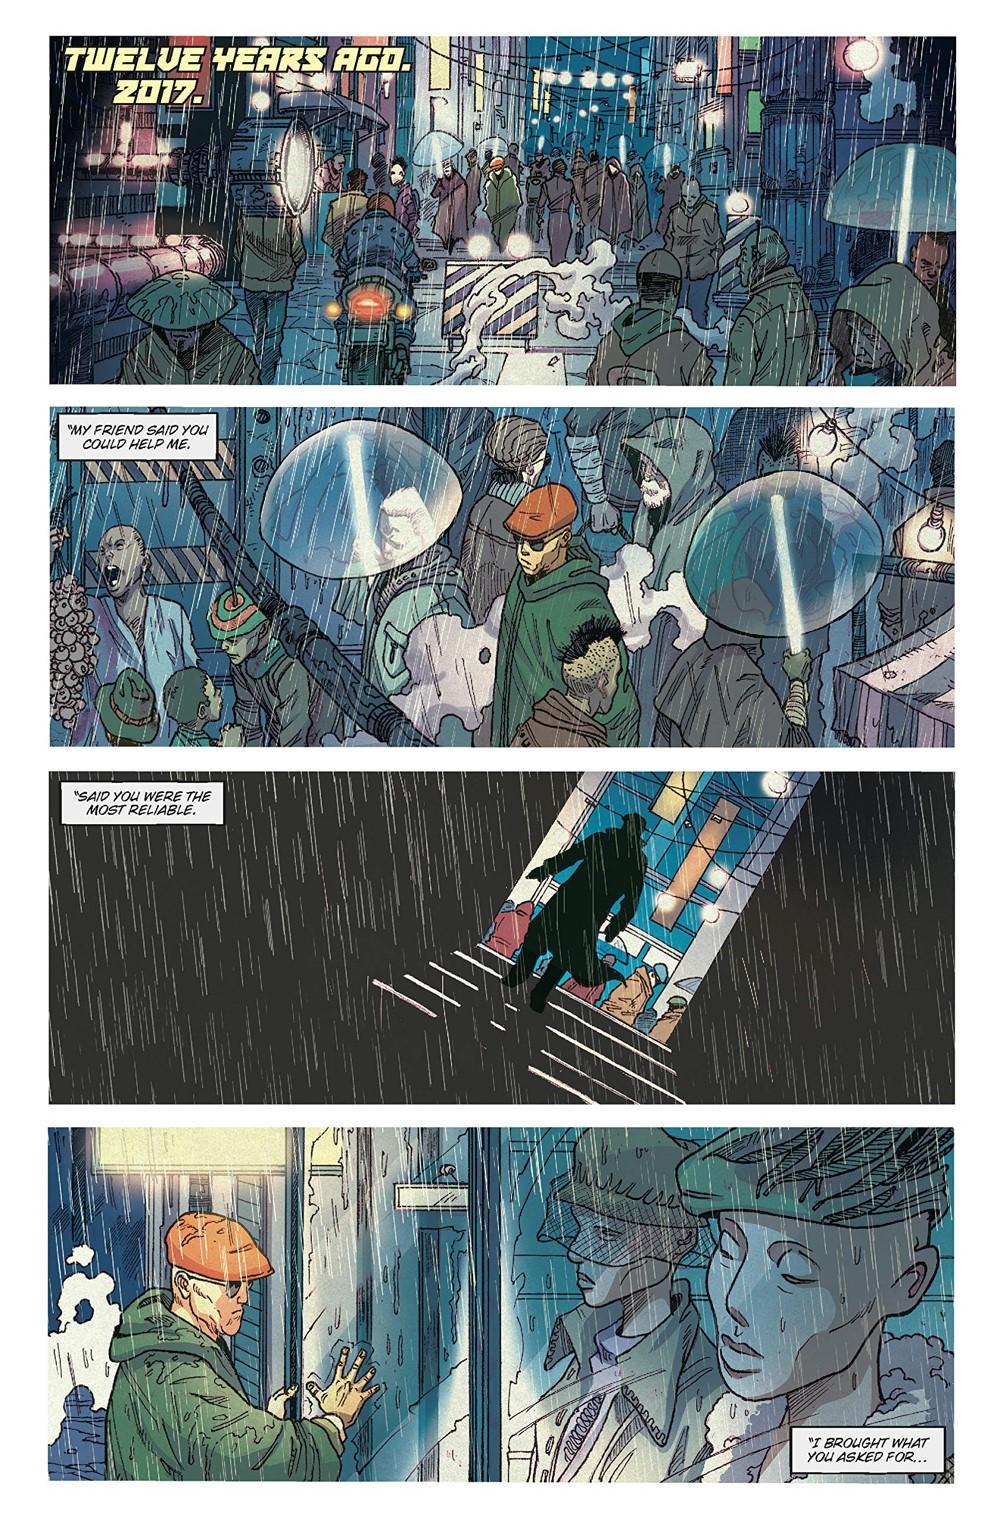 BR-Reunion-1 ComicList Previews: BLADE RUNNER 2029 VOLUME 1 REUNION TP